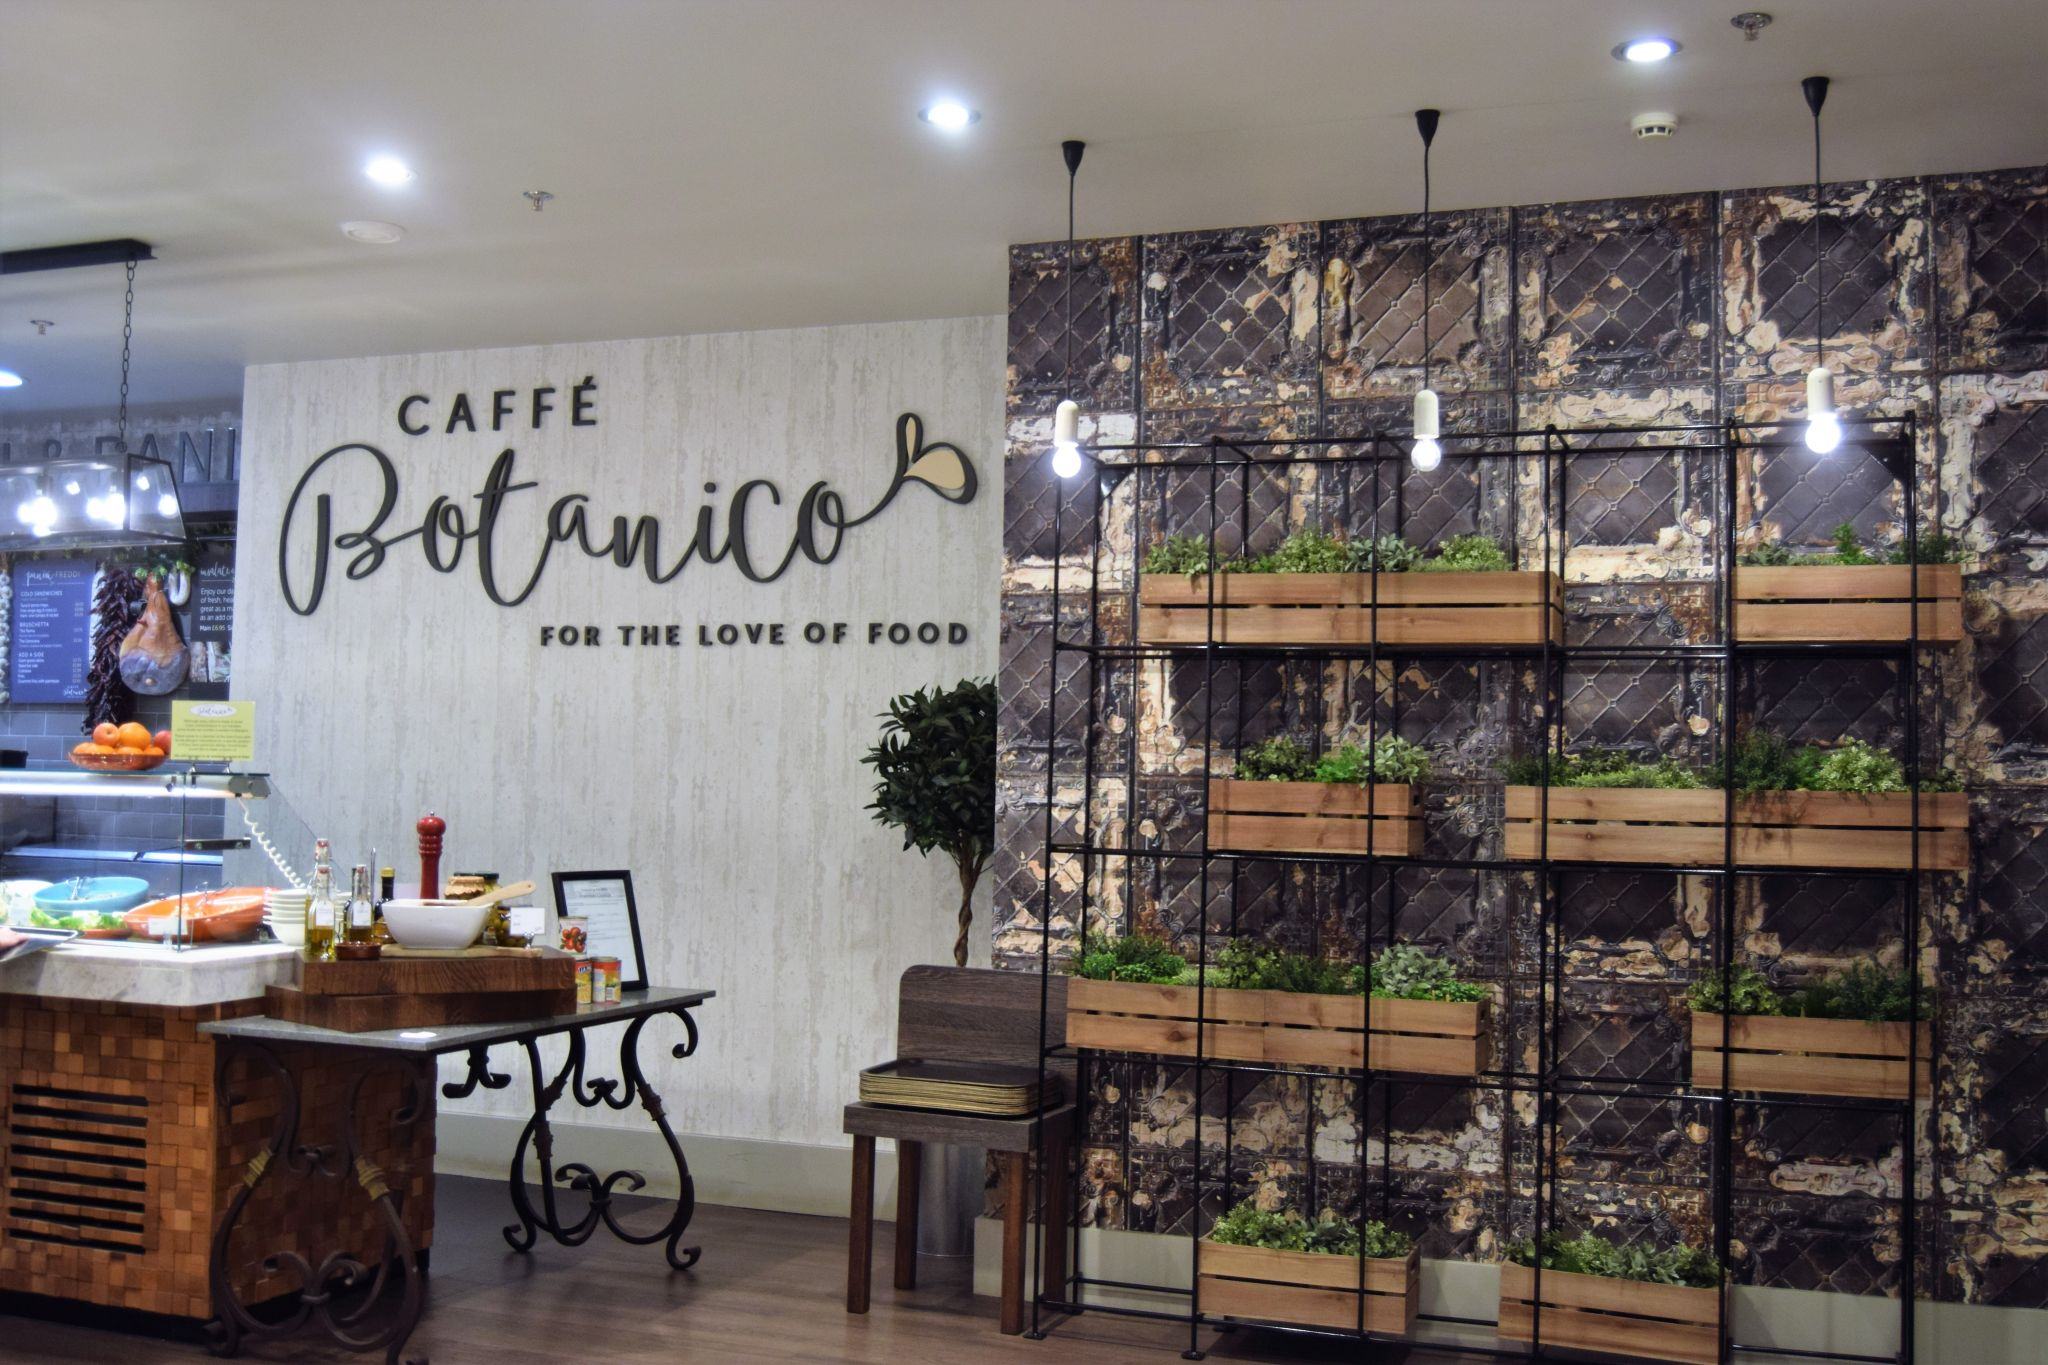 DSC 3208 1440x960 - Caffe Botanico: A Gluten Free Oasis